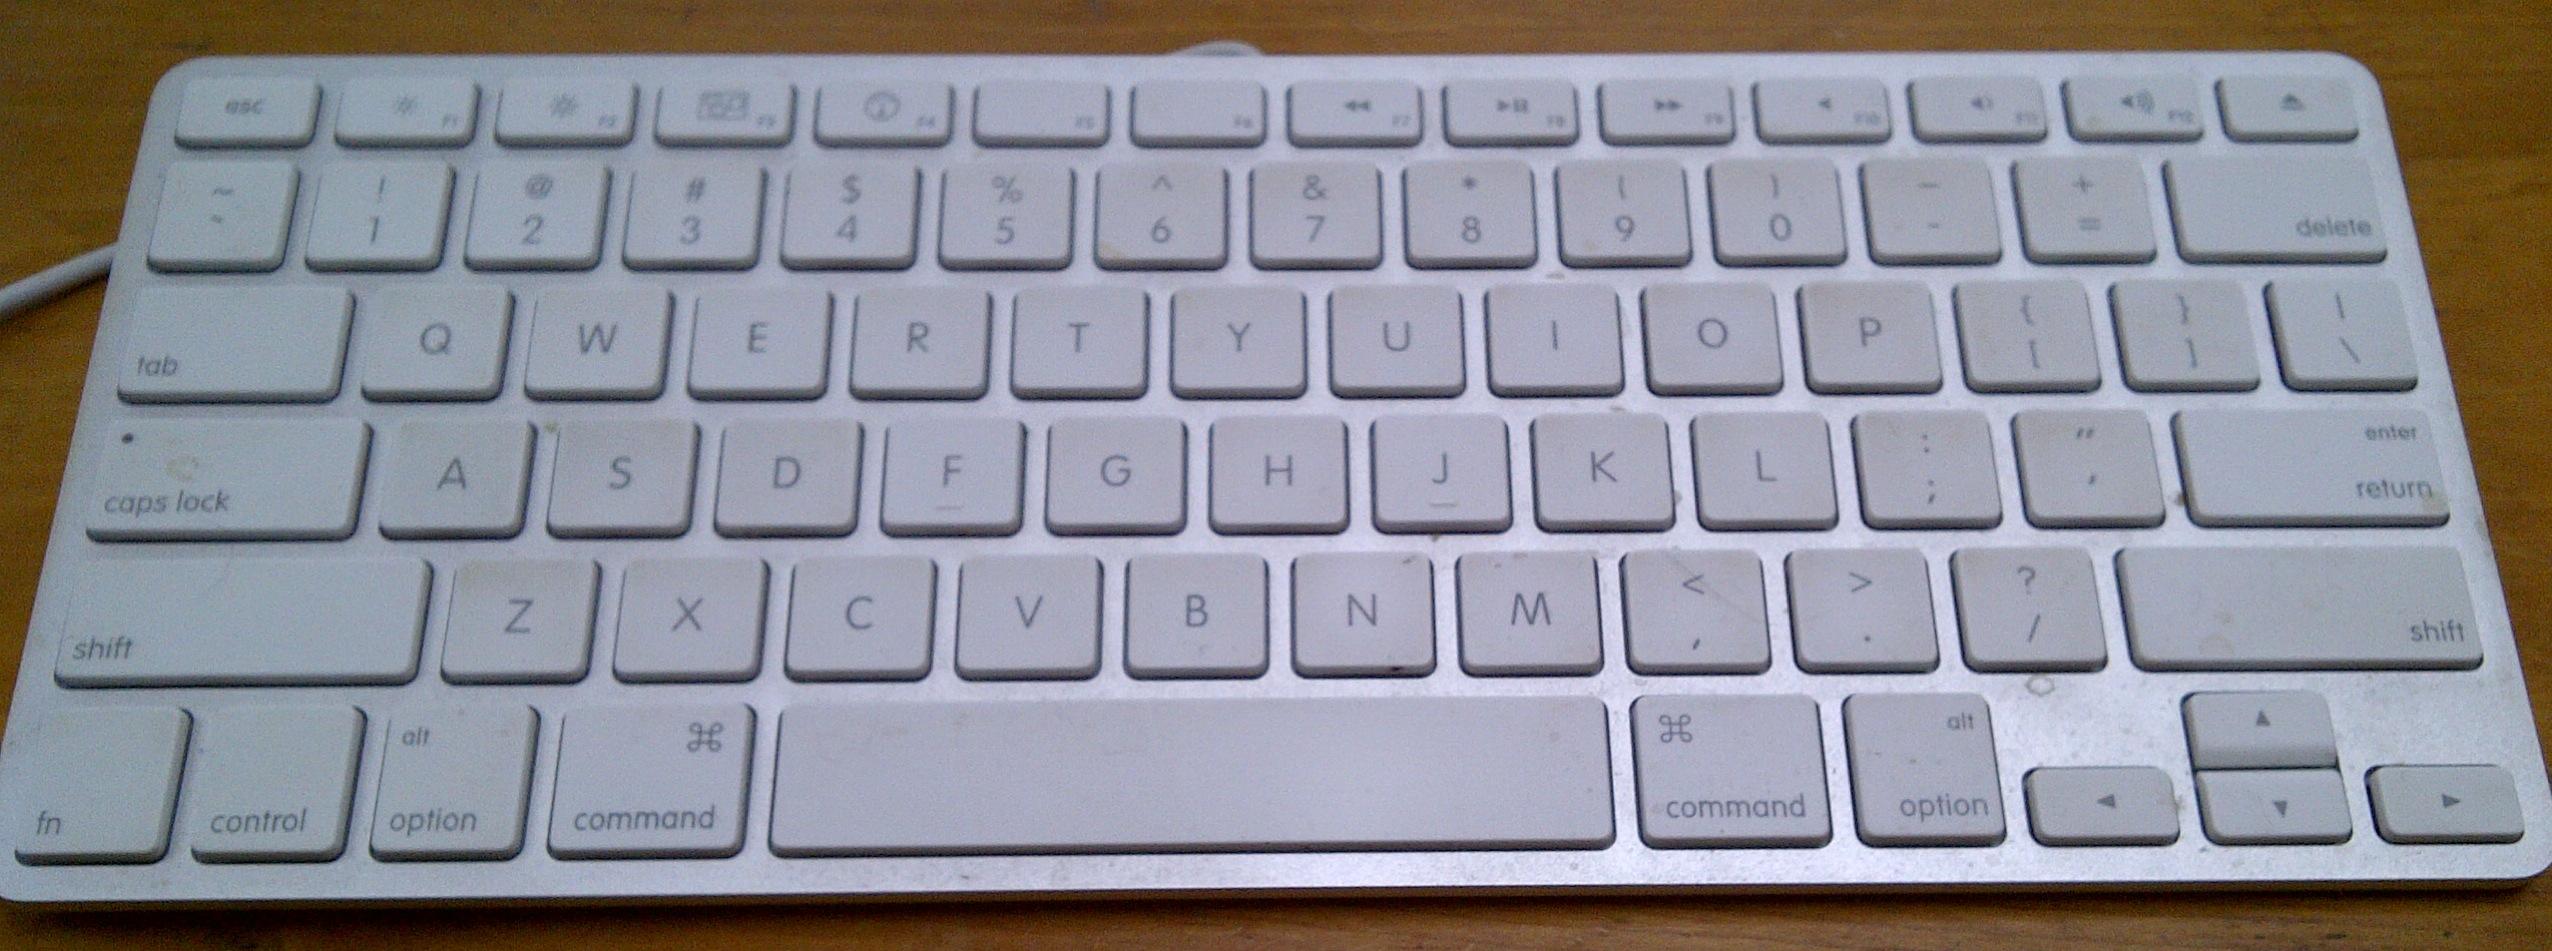 how to take off mac laptop keys